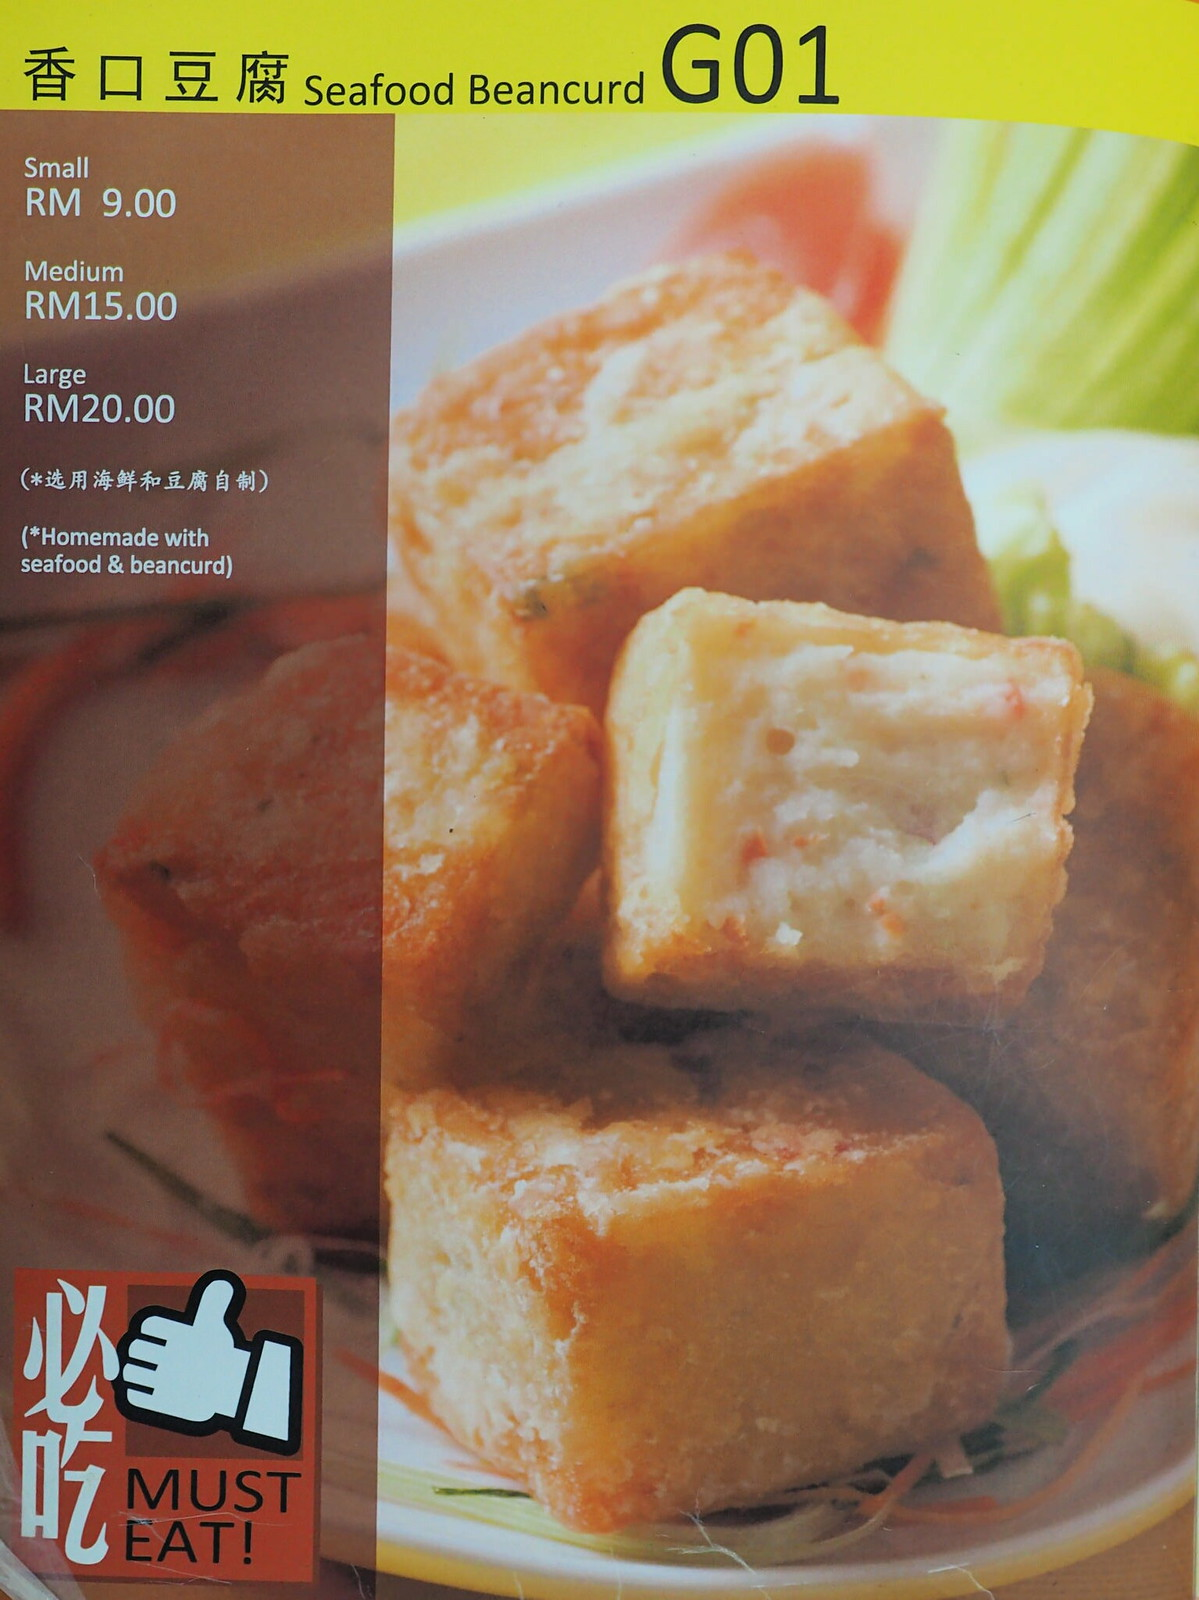 Seafood Beancurd (Tofu)